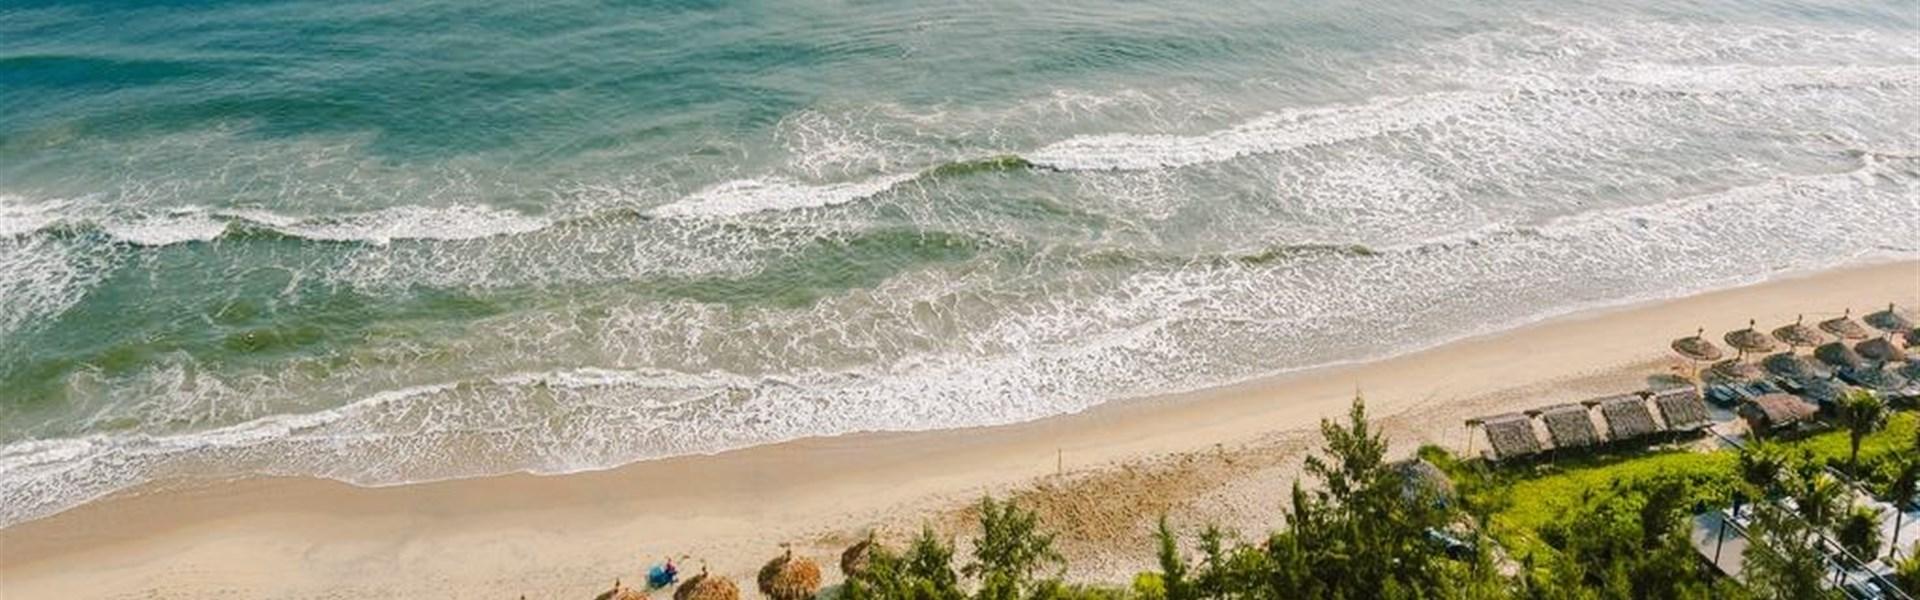 Zájezd k moři - Hoi An - Aira Boutigue - Vietnam - Hoi An - hotel Aira - pláž